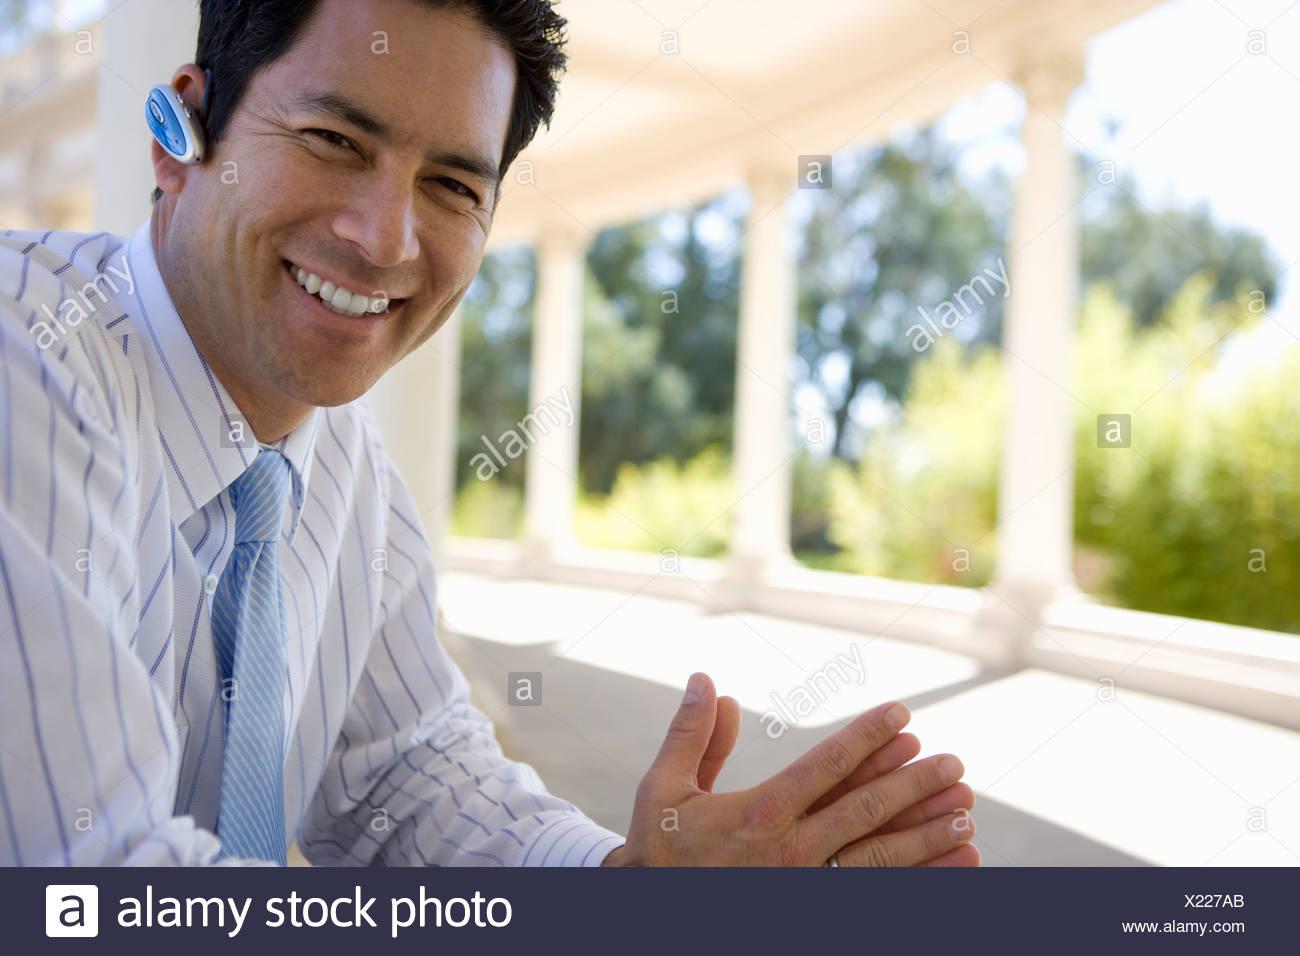 Empresario con dispositivo manos libres al aire libre Imagen De Stock